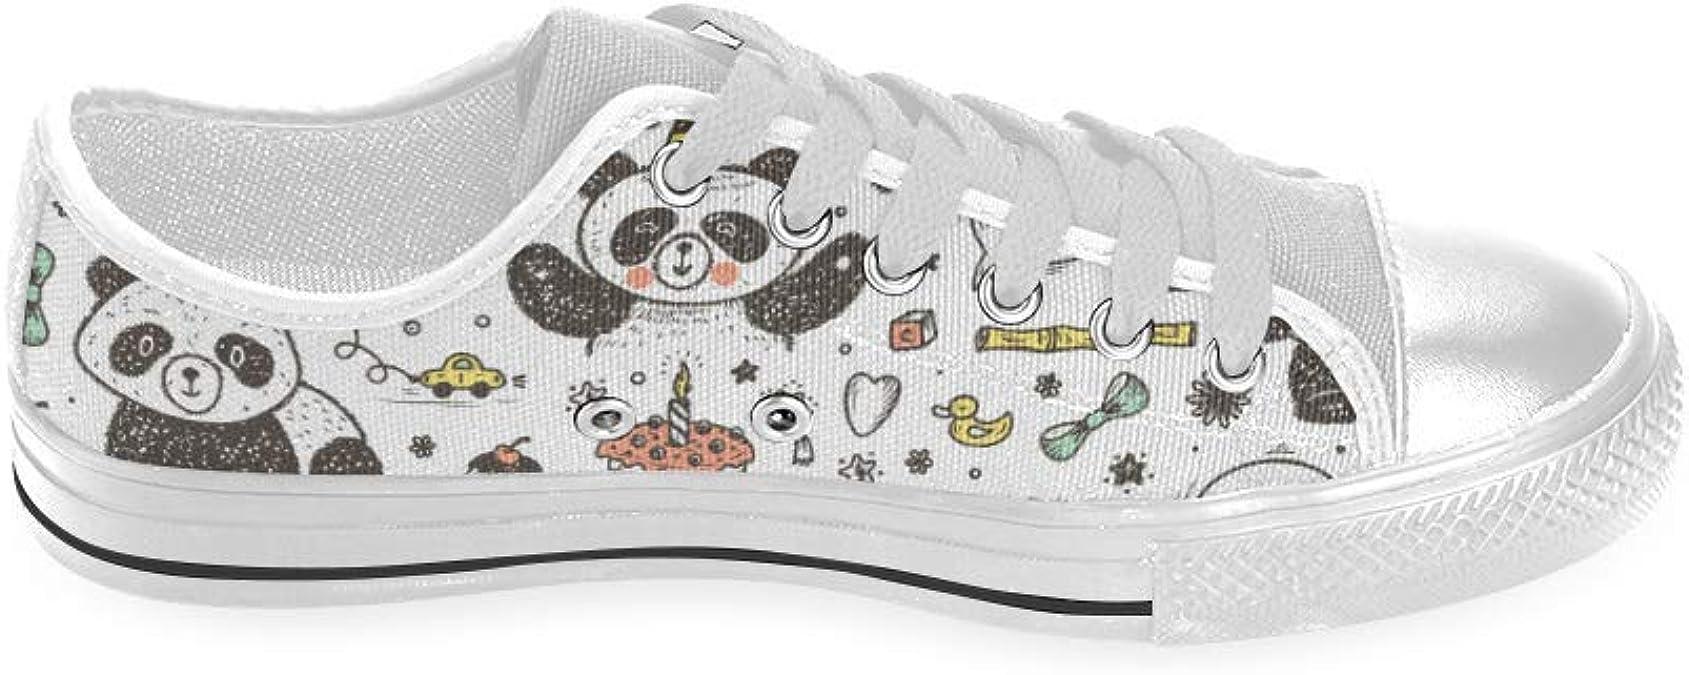 INTERESTPRINT Cute Panda Aquila High Top Canvas Shoes for Big Kids Boys Girls